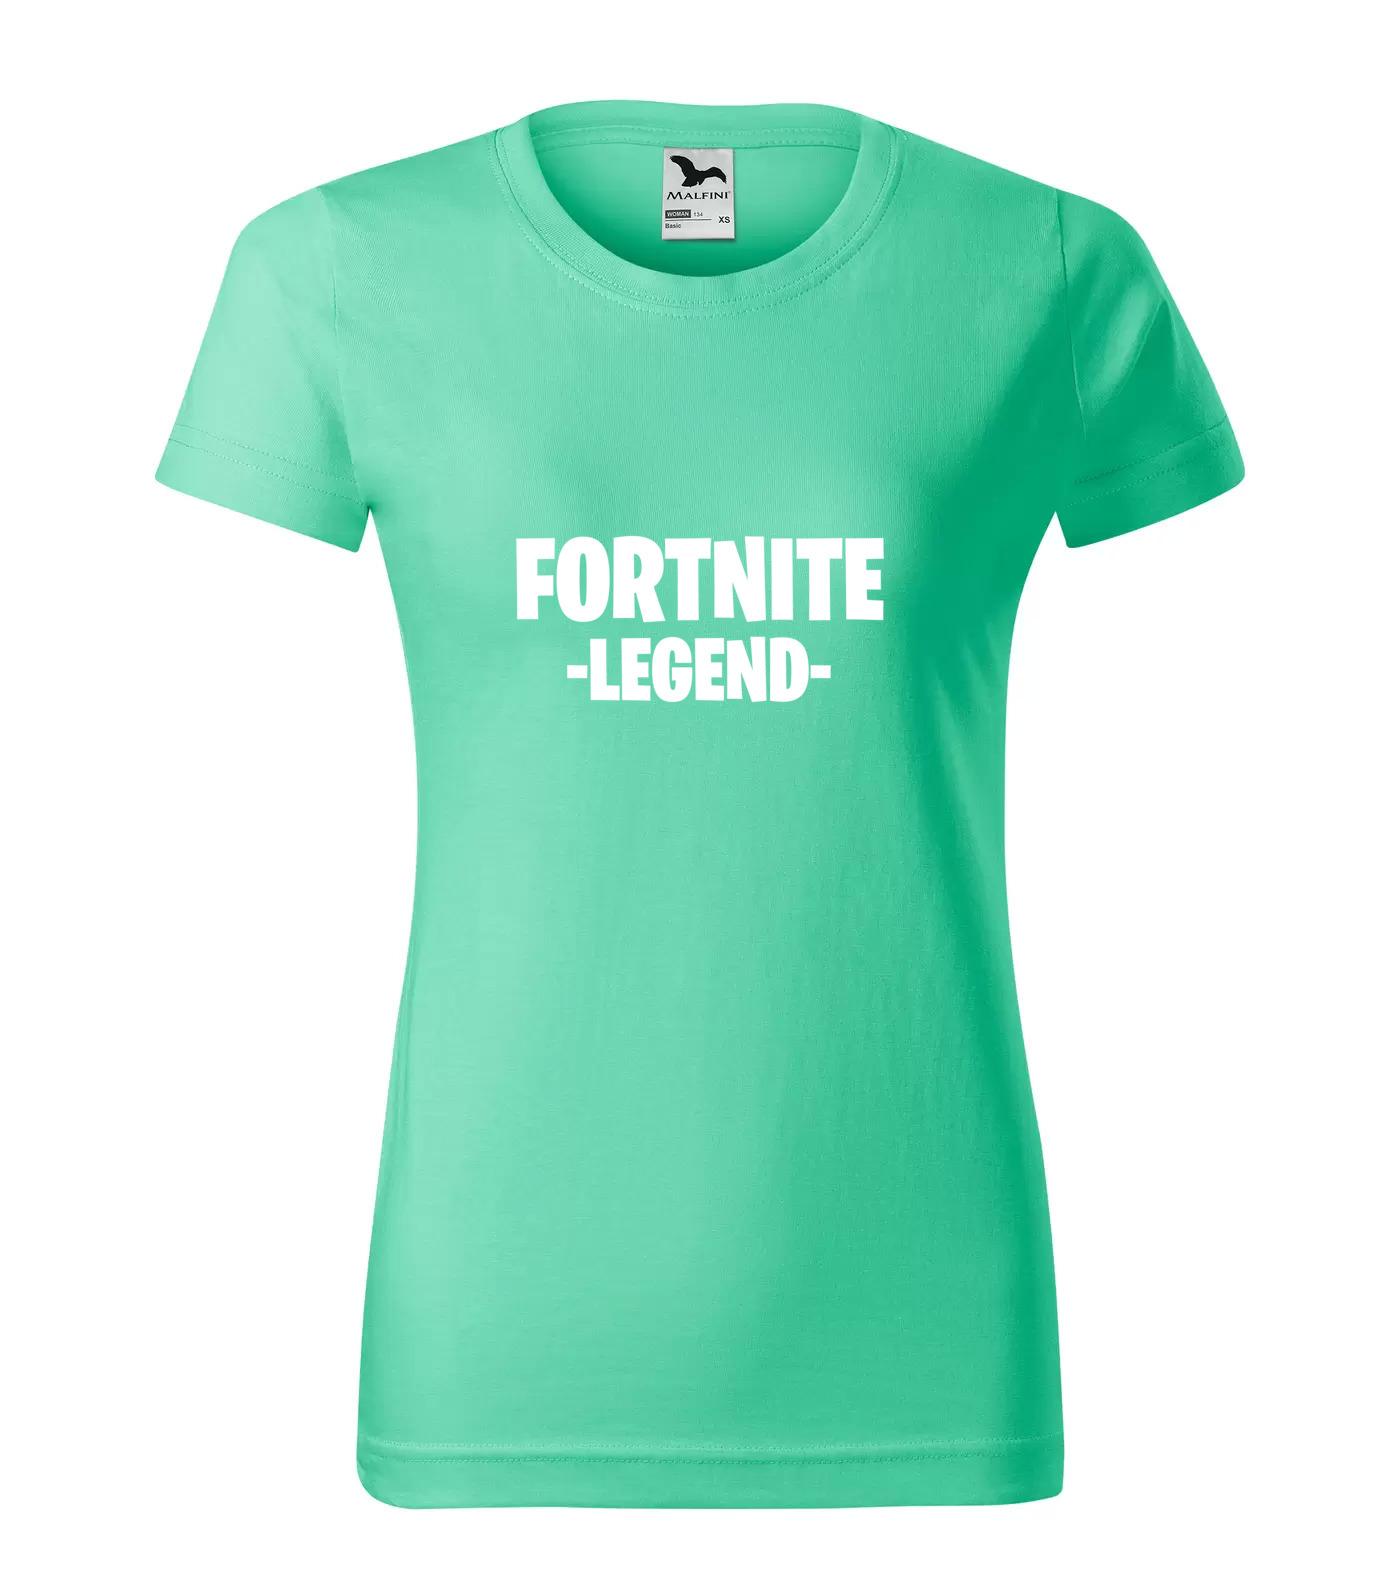 Tričko Fortnite Legend Bílá 1